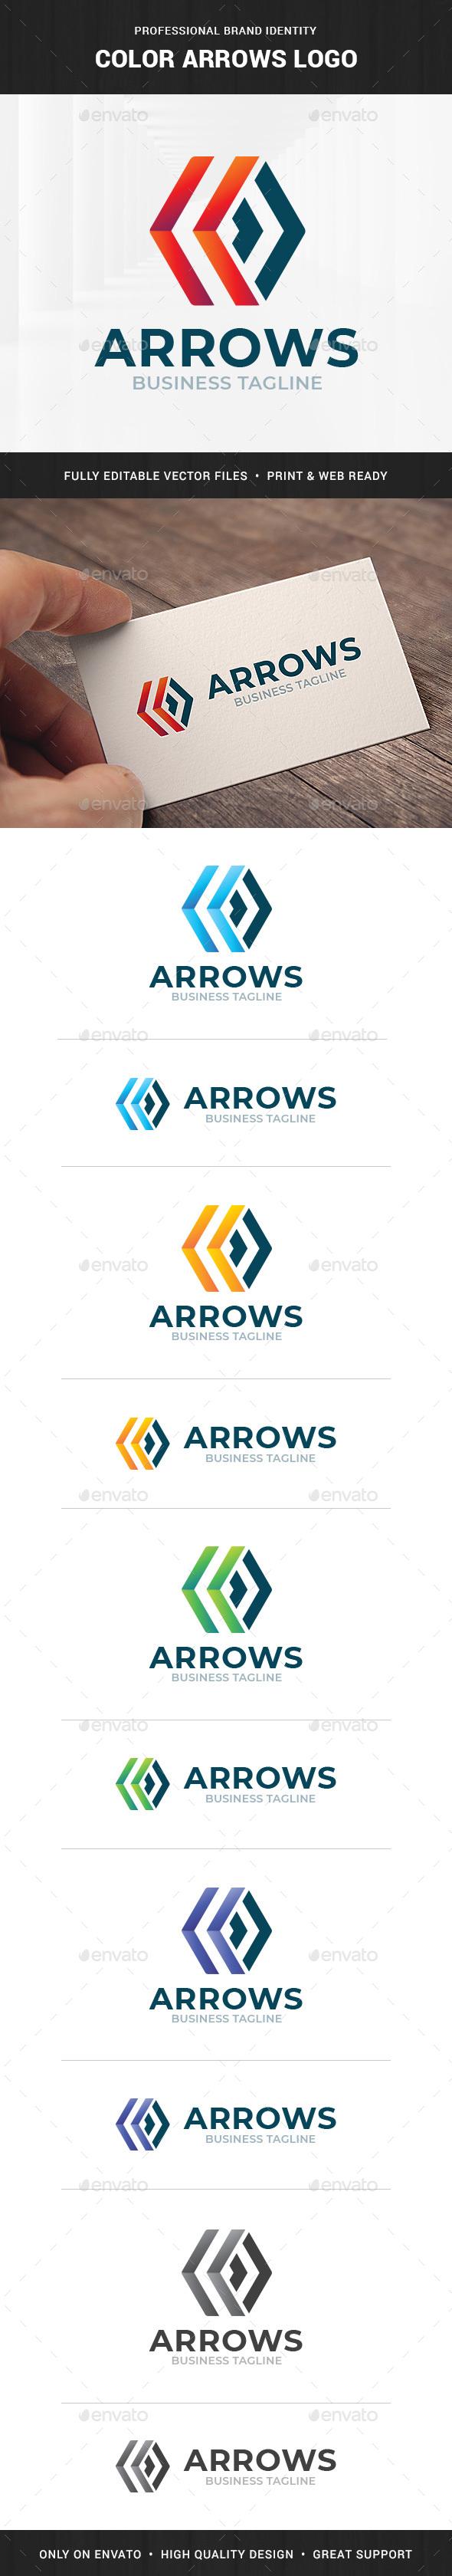 Color Arrows Logo Template